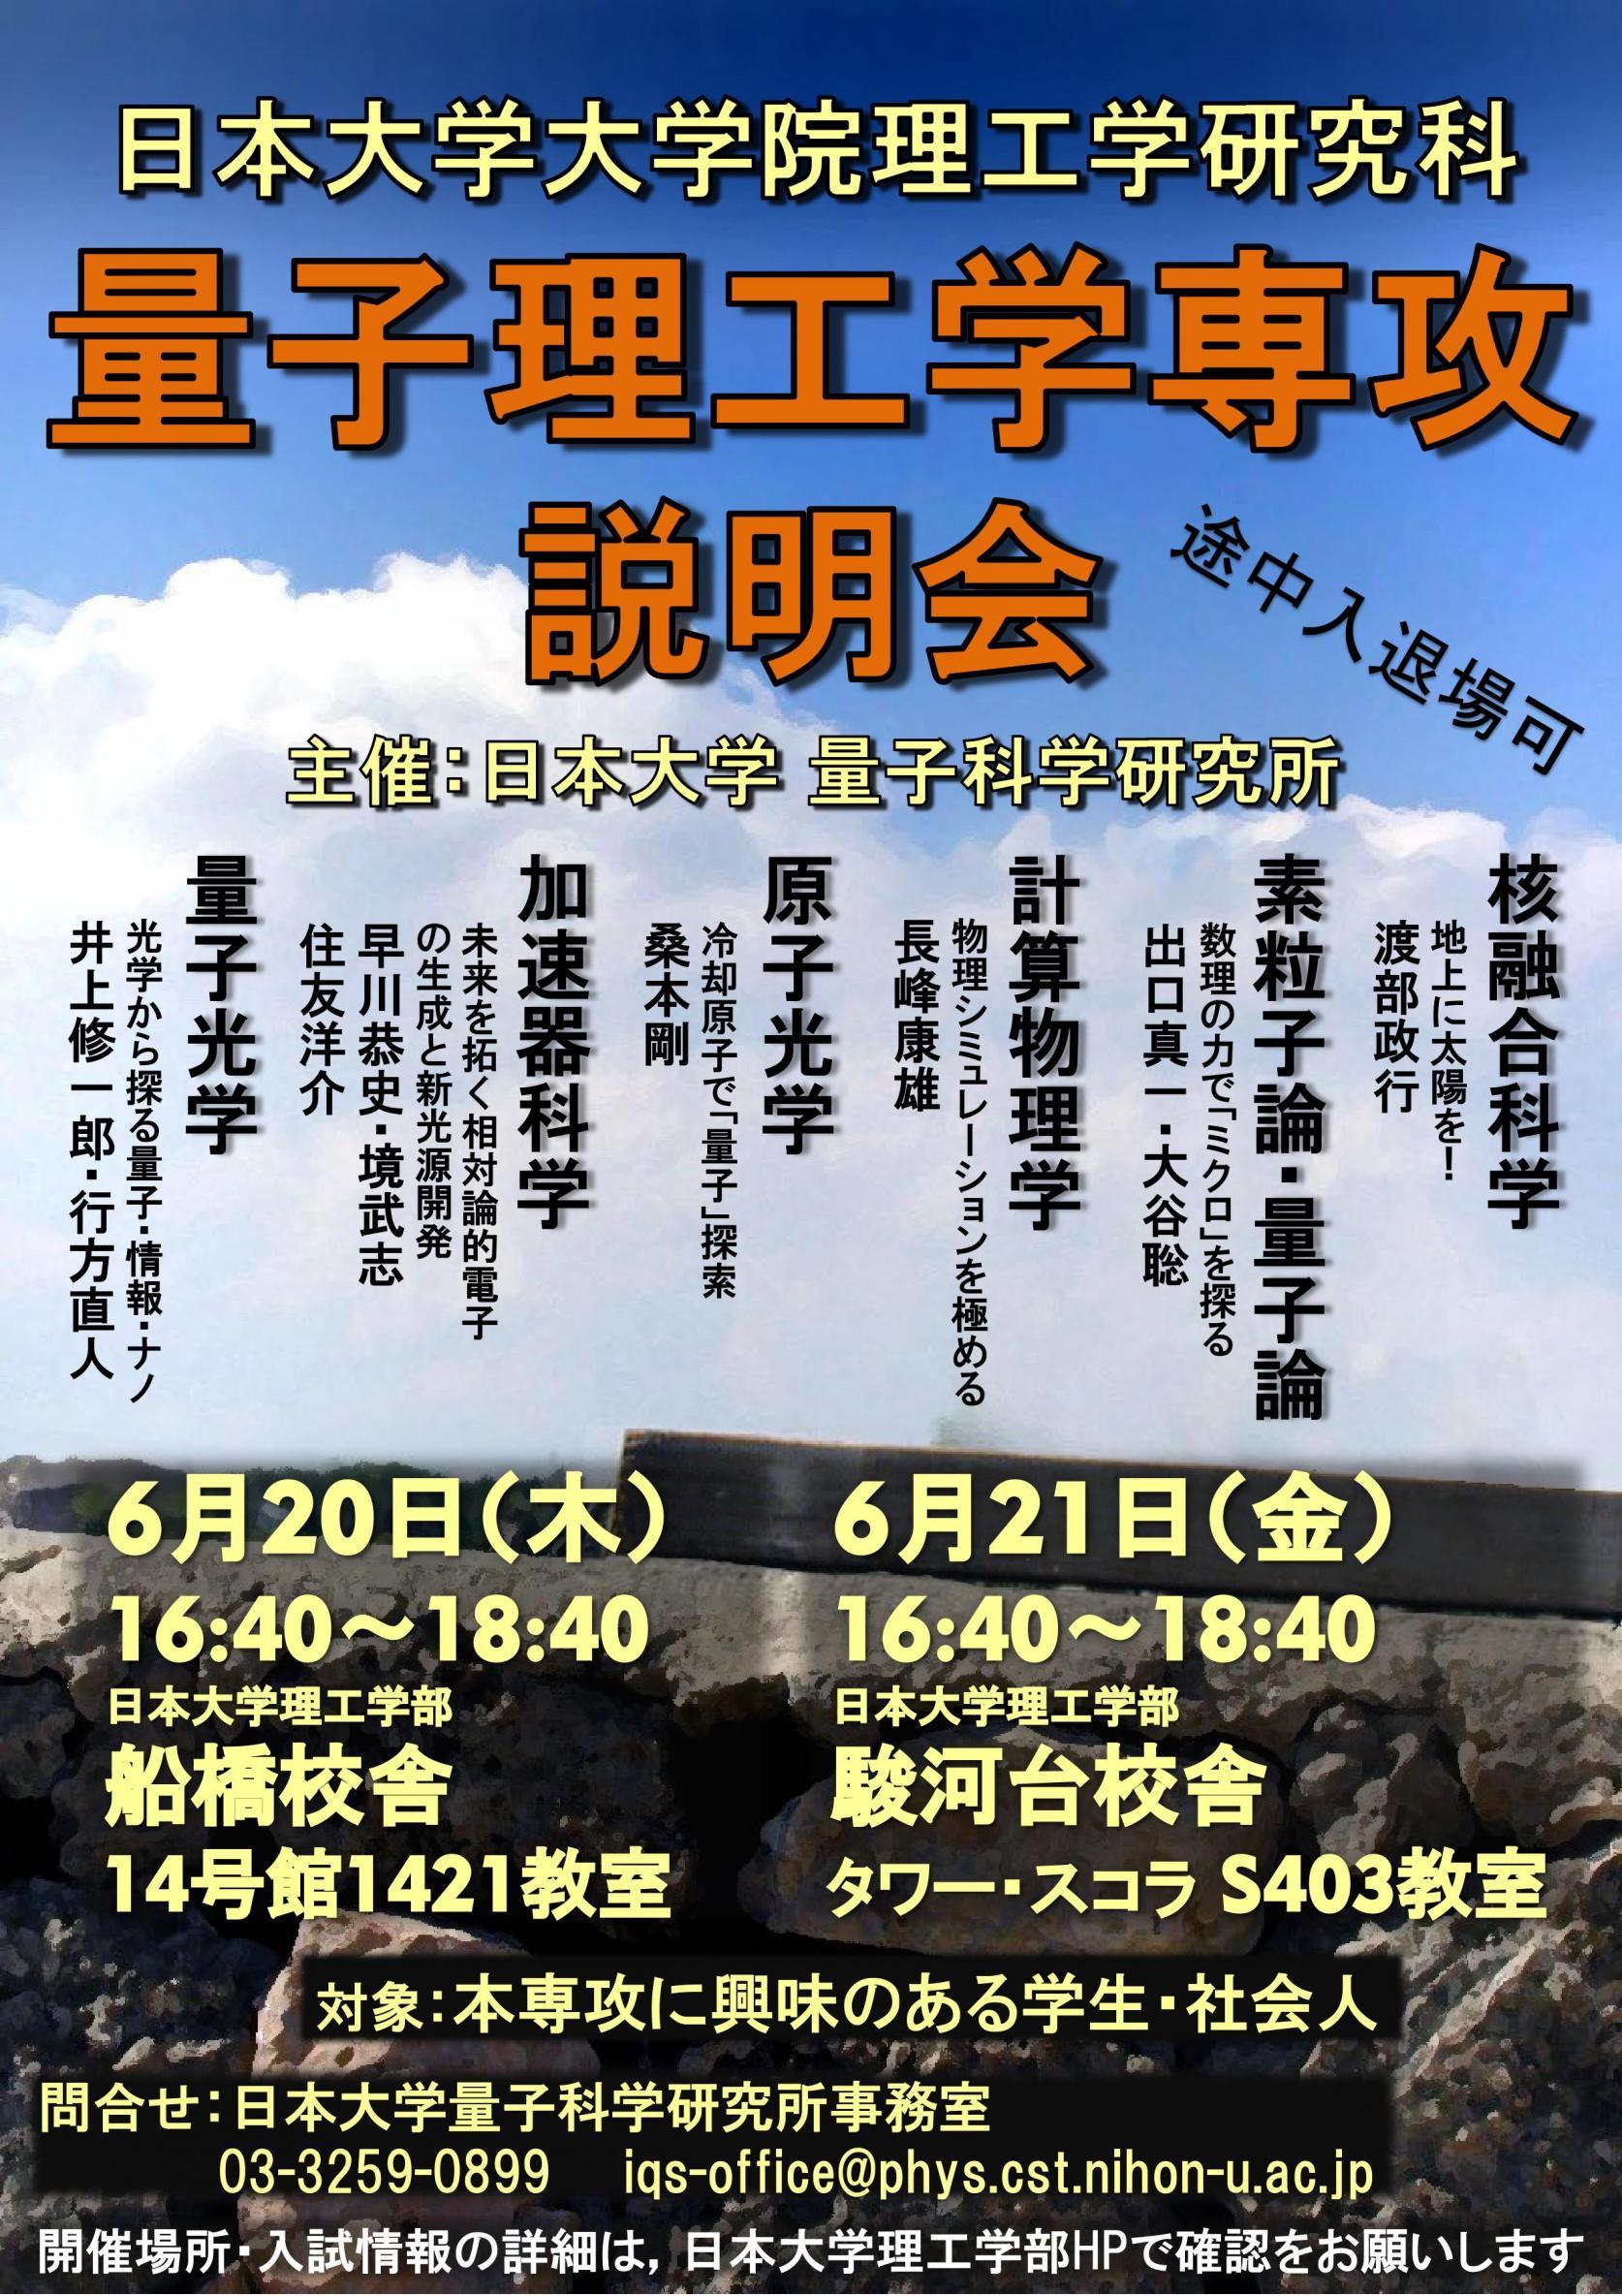 6月20日(木)・21日(金)に、日本大学大学院理工学研究科 量子理工学専攻説明会を開催します。